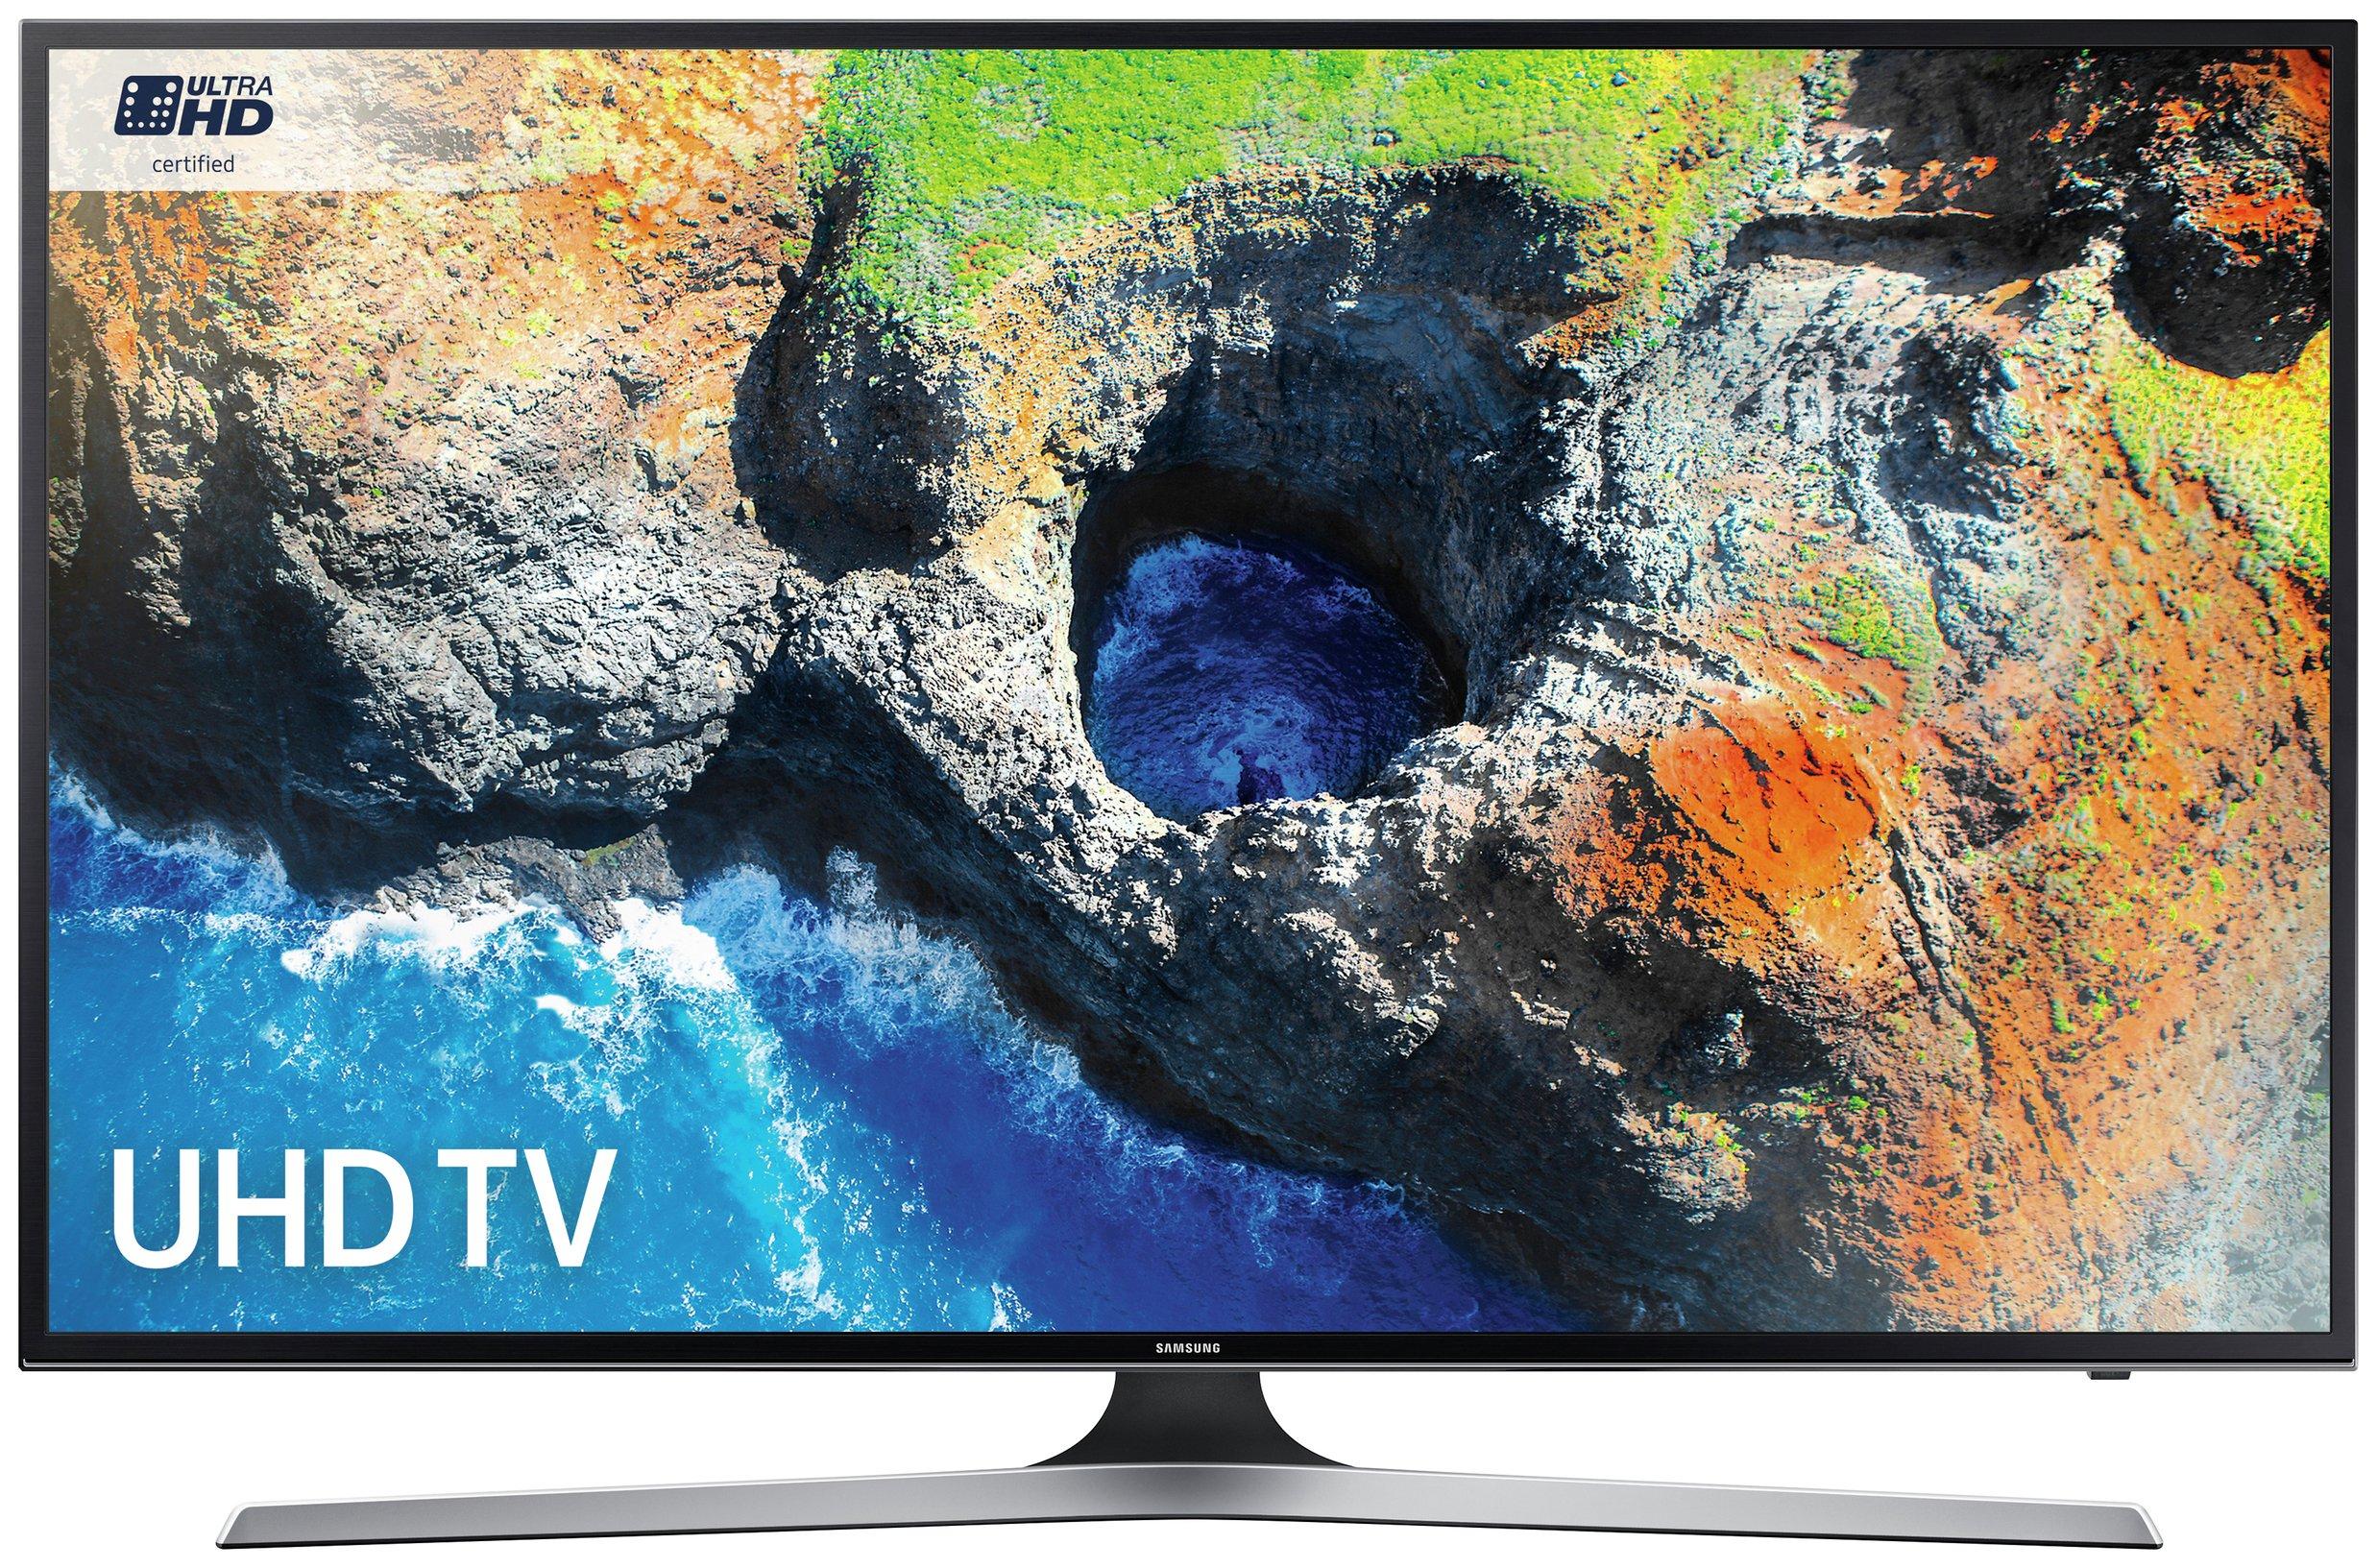 Samsung Samsung MU6120 65 Inch Smart 4K Ultra HD TV with HDR.